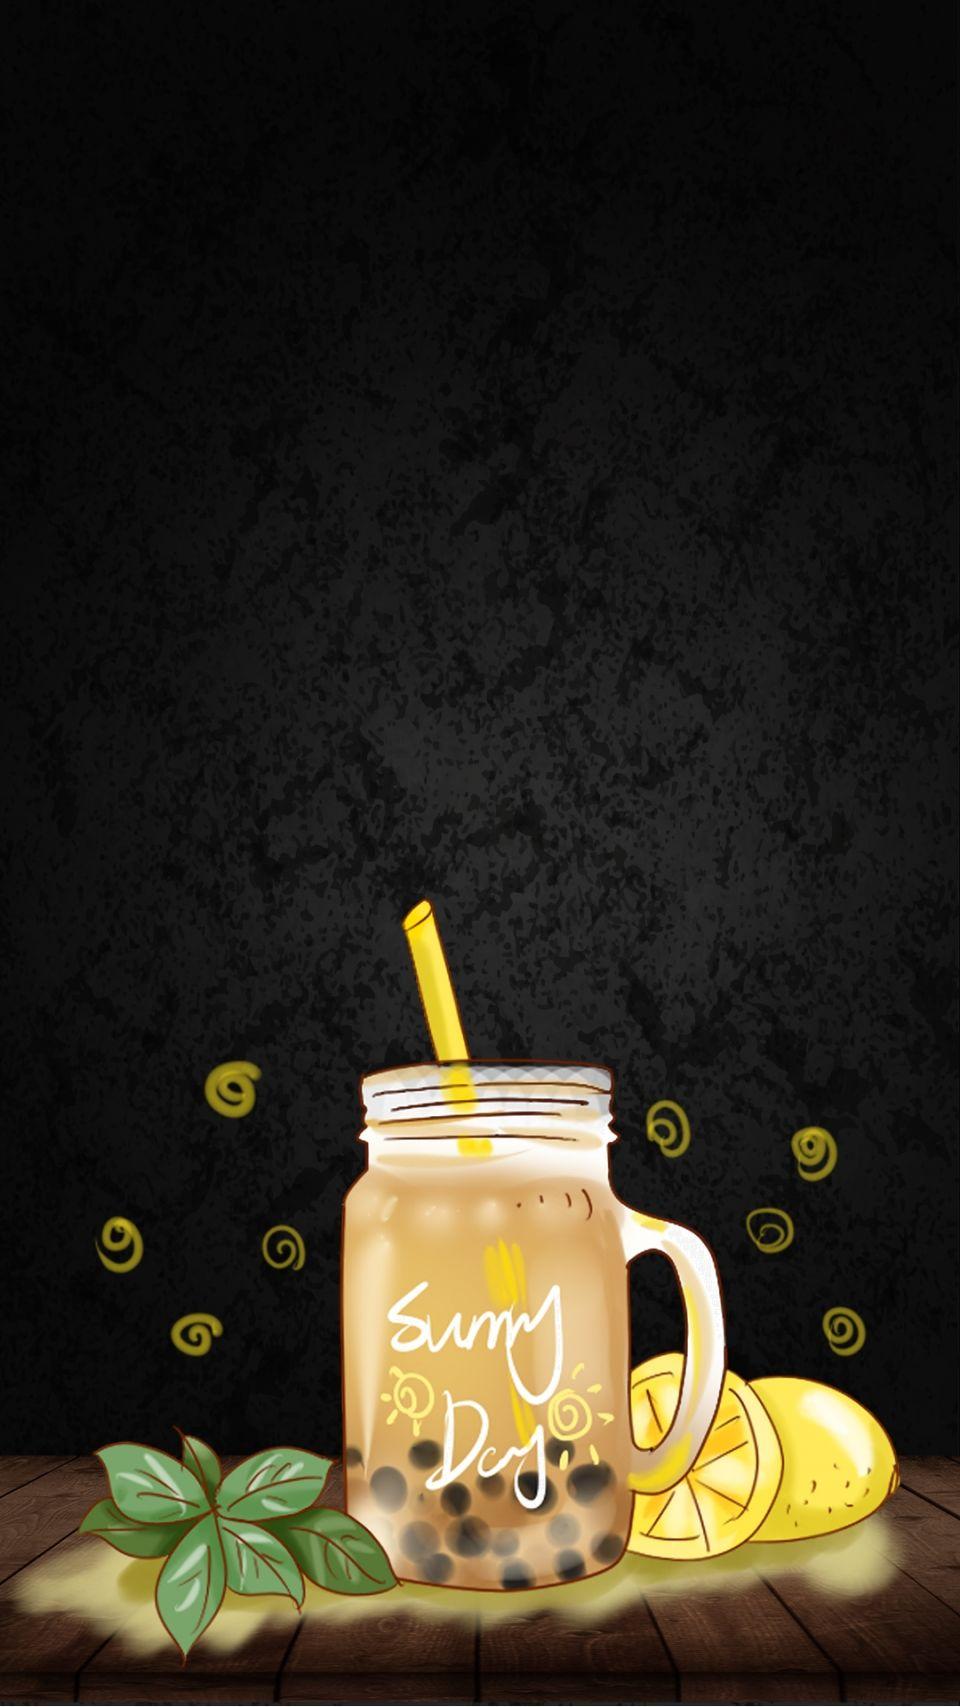 Black Orange Milk Tea Drink Orange Ch5 Background Material Milk Tea Tea Wallpaper Drinking Tea